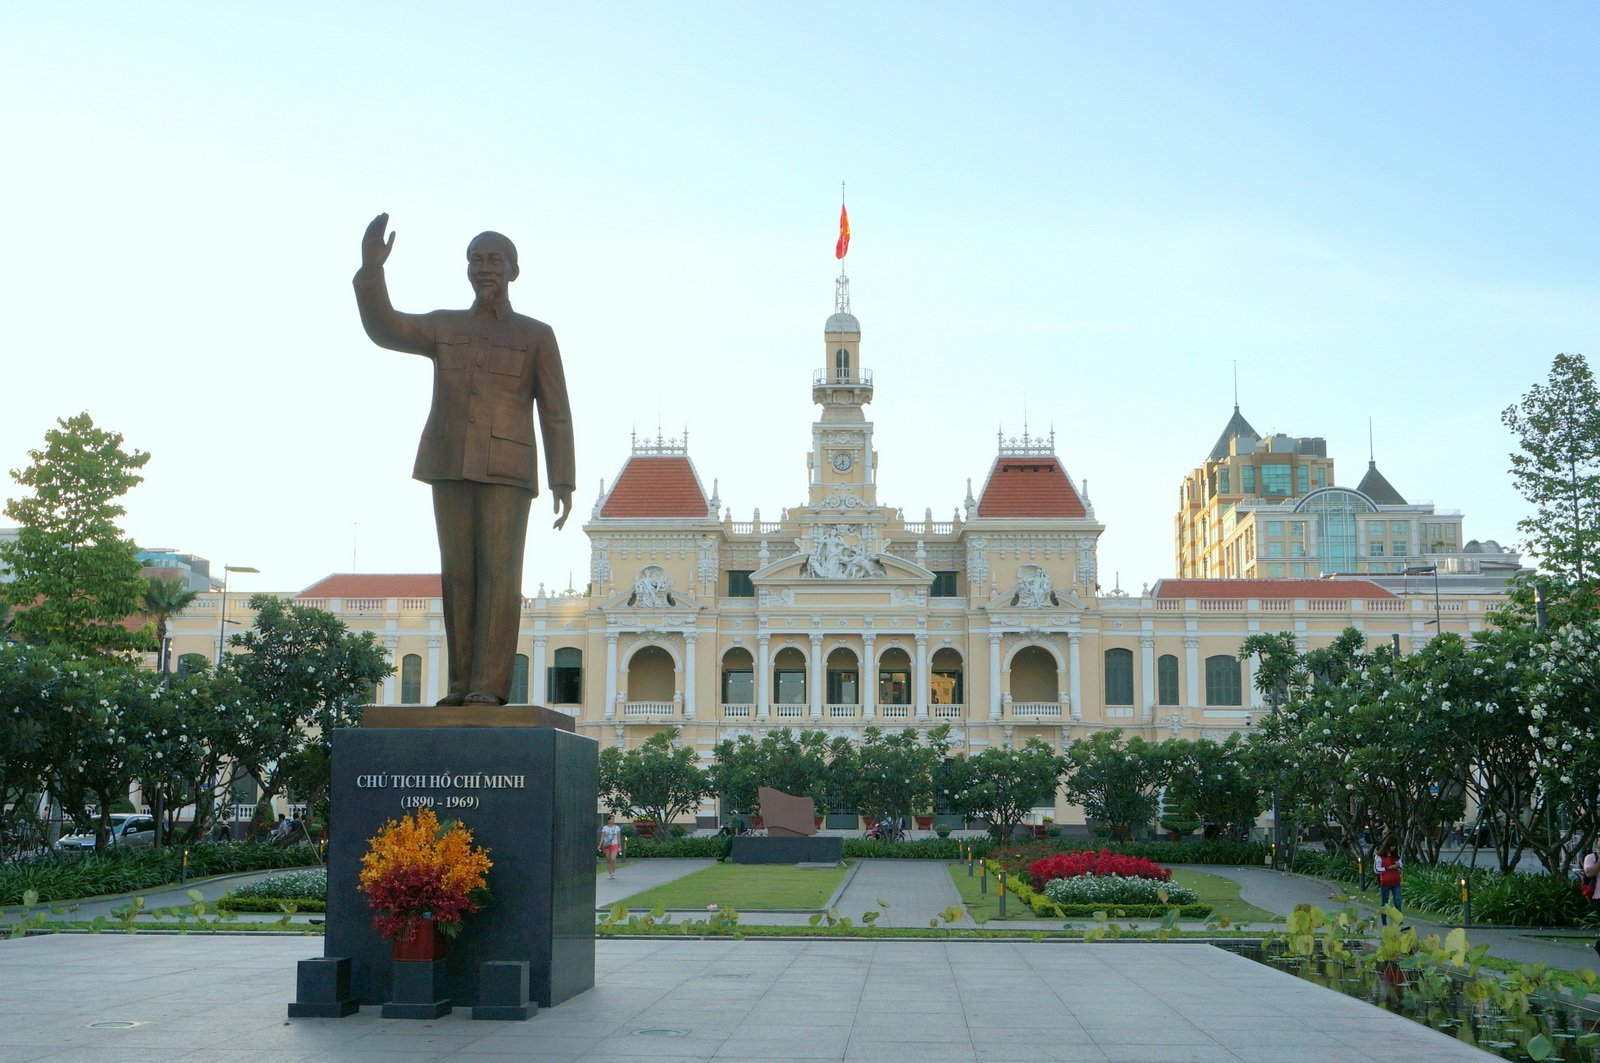 Ho Chi Minh - Vietnam | cómo organizar un viaje a Vietnam